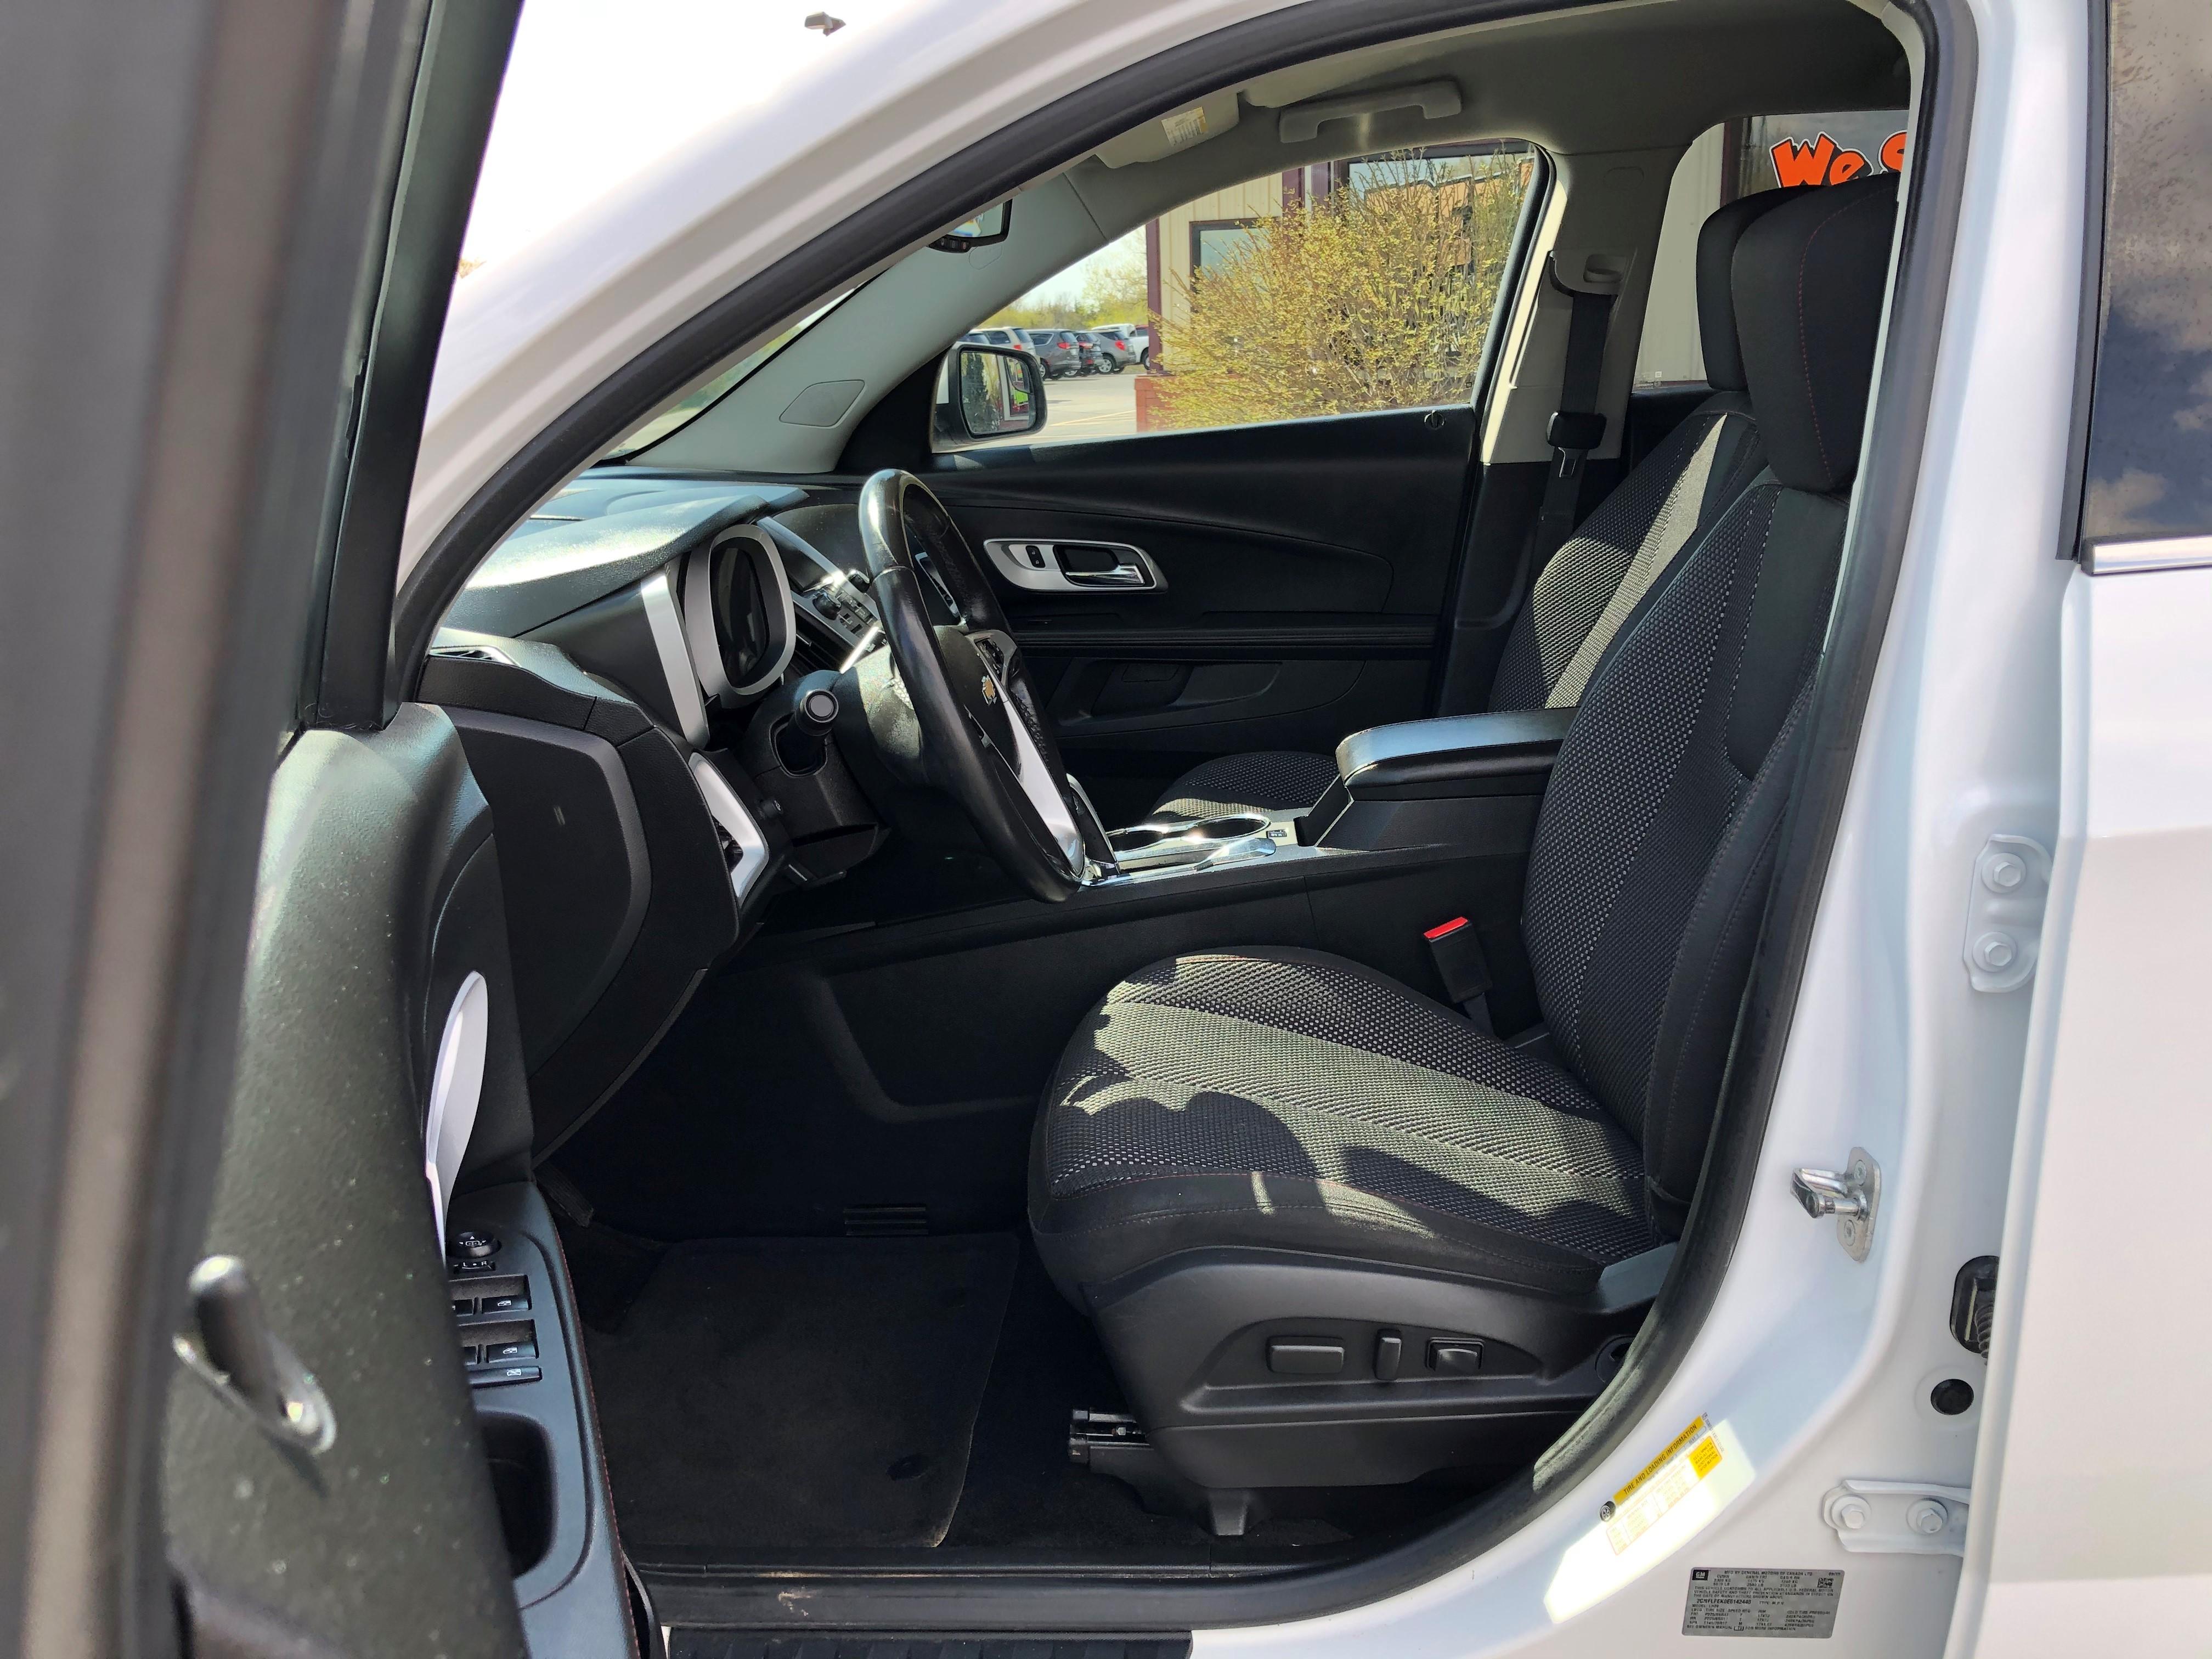 used vehicle - SUV CHEVROLET EQUINOX 2014